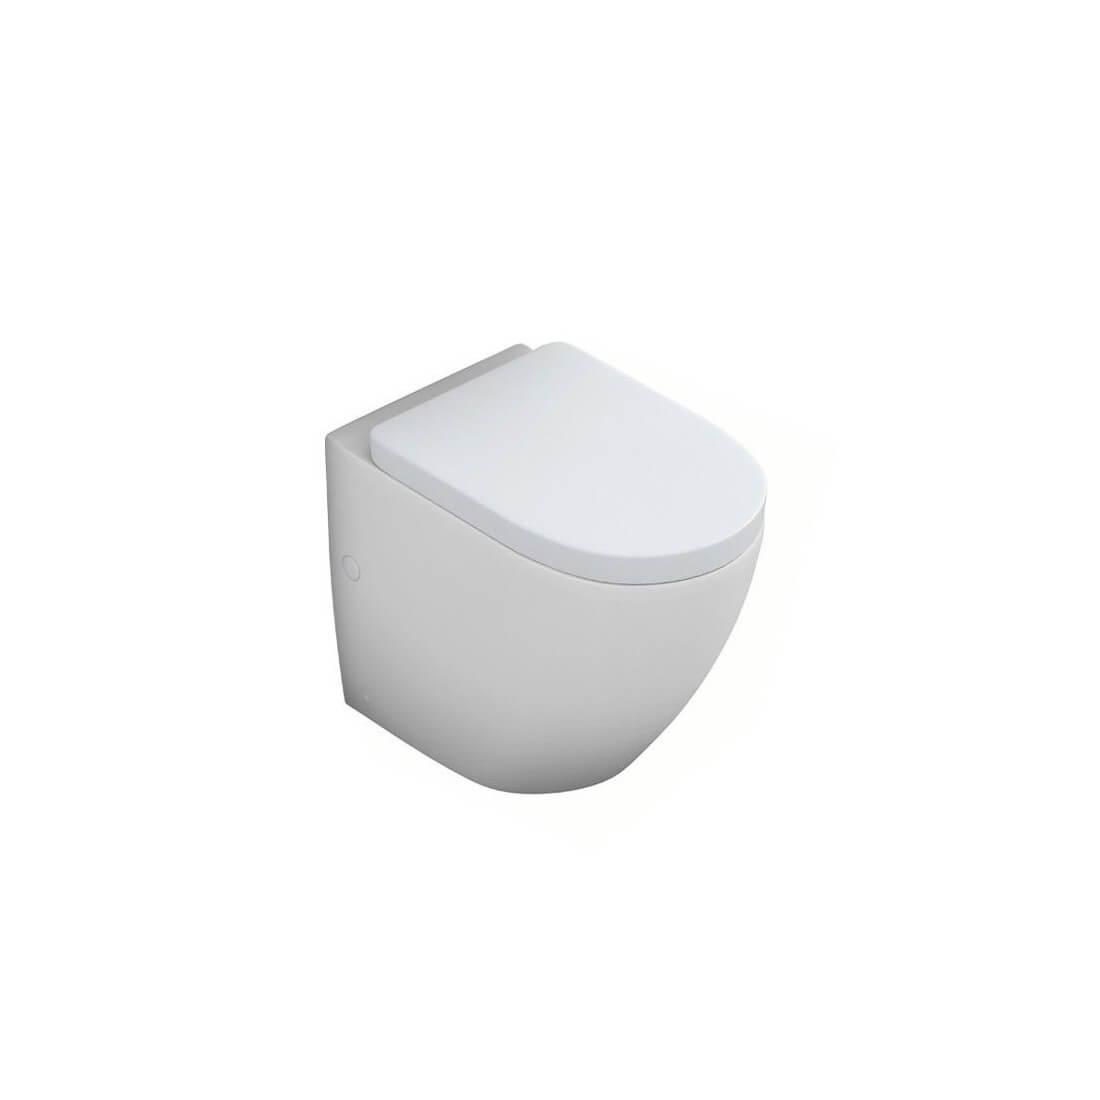 Inodoro compacto sin cisterna modelo Verona